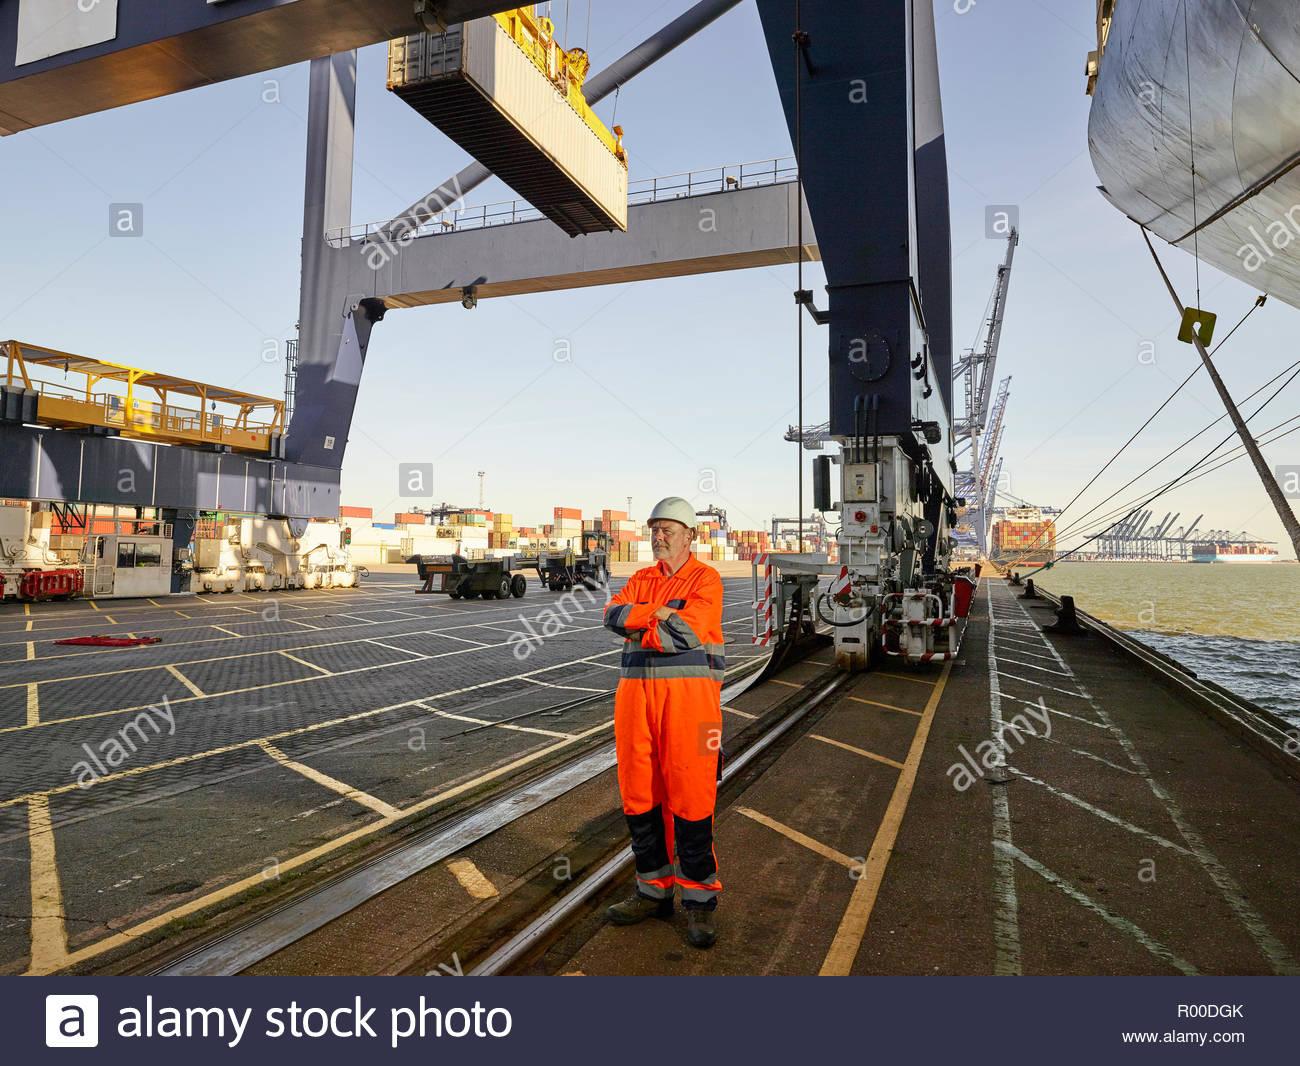 Dock worker in orange jumpsuit at Port of Felixstowe, England - Stock Image